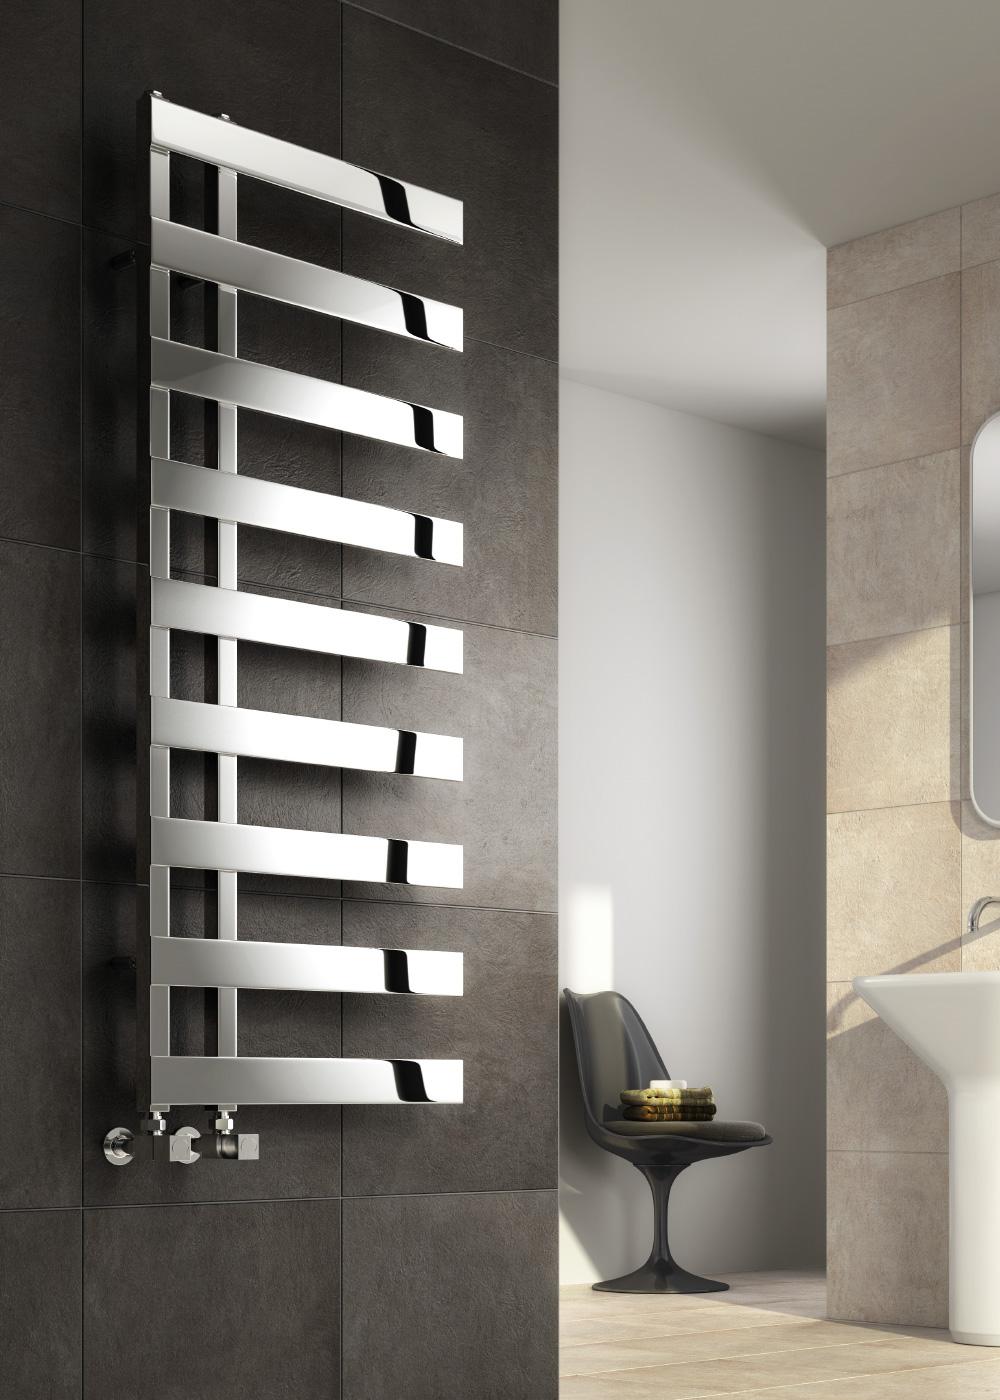 Reina Capelli Bathroom Towel Rail